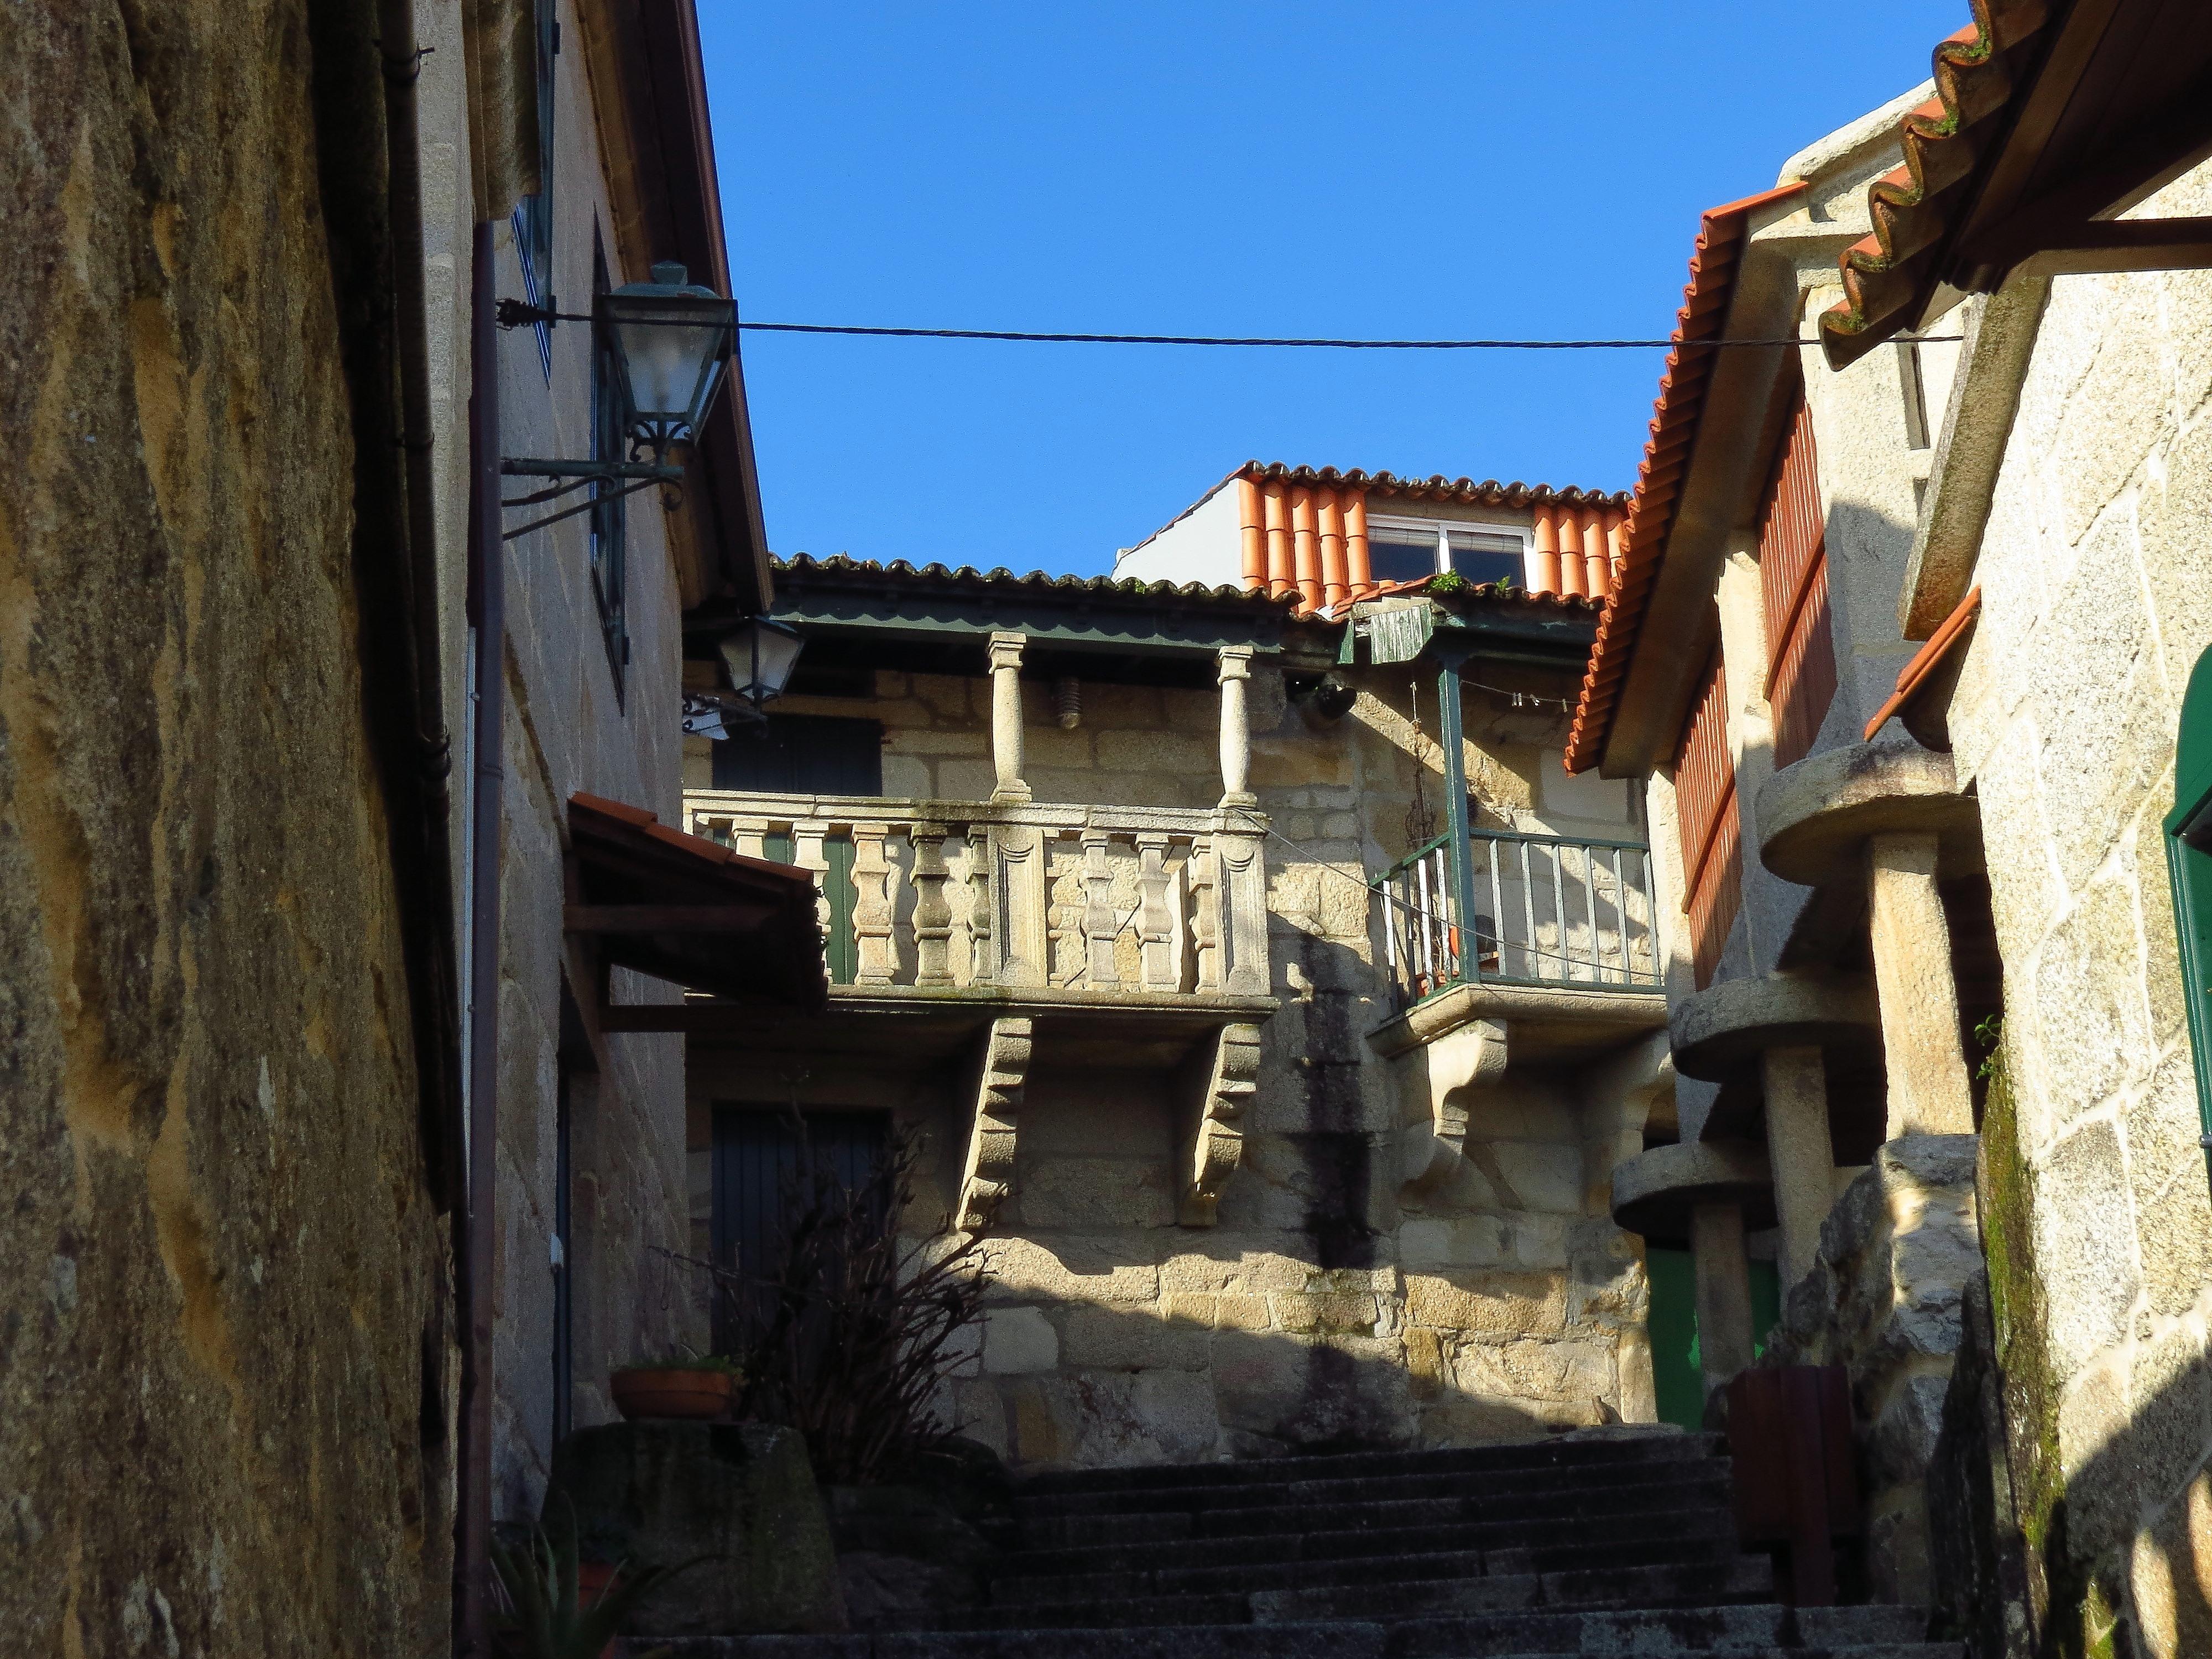 Landscape Road Street House Town Alley Home Village Spain Ruins Galicia  Pontevedra Combarro Paisajes Espana Ggl1